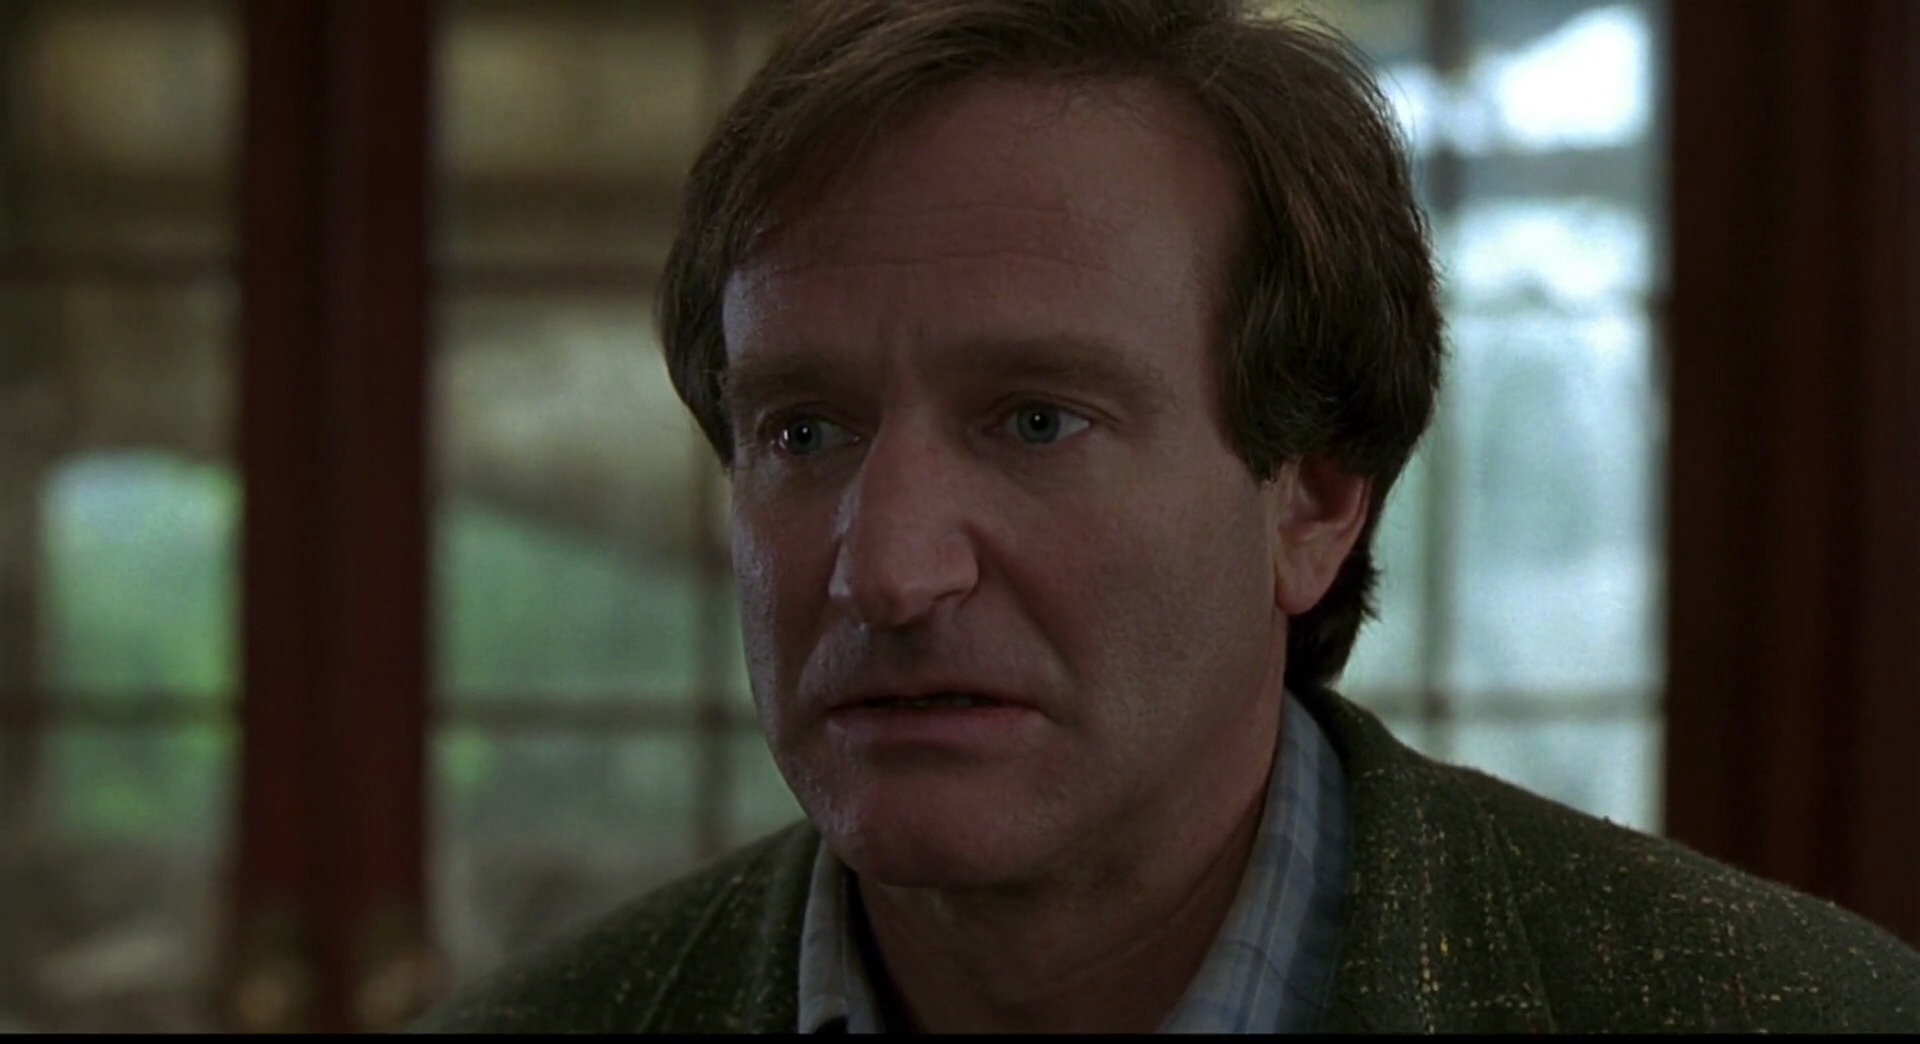 Robin in Jumanji - Robin Williams Fan Art (37487321) - Fanpop